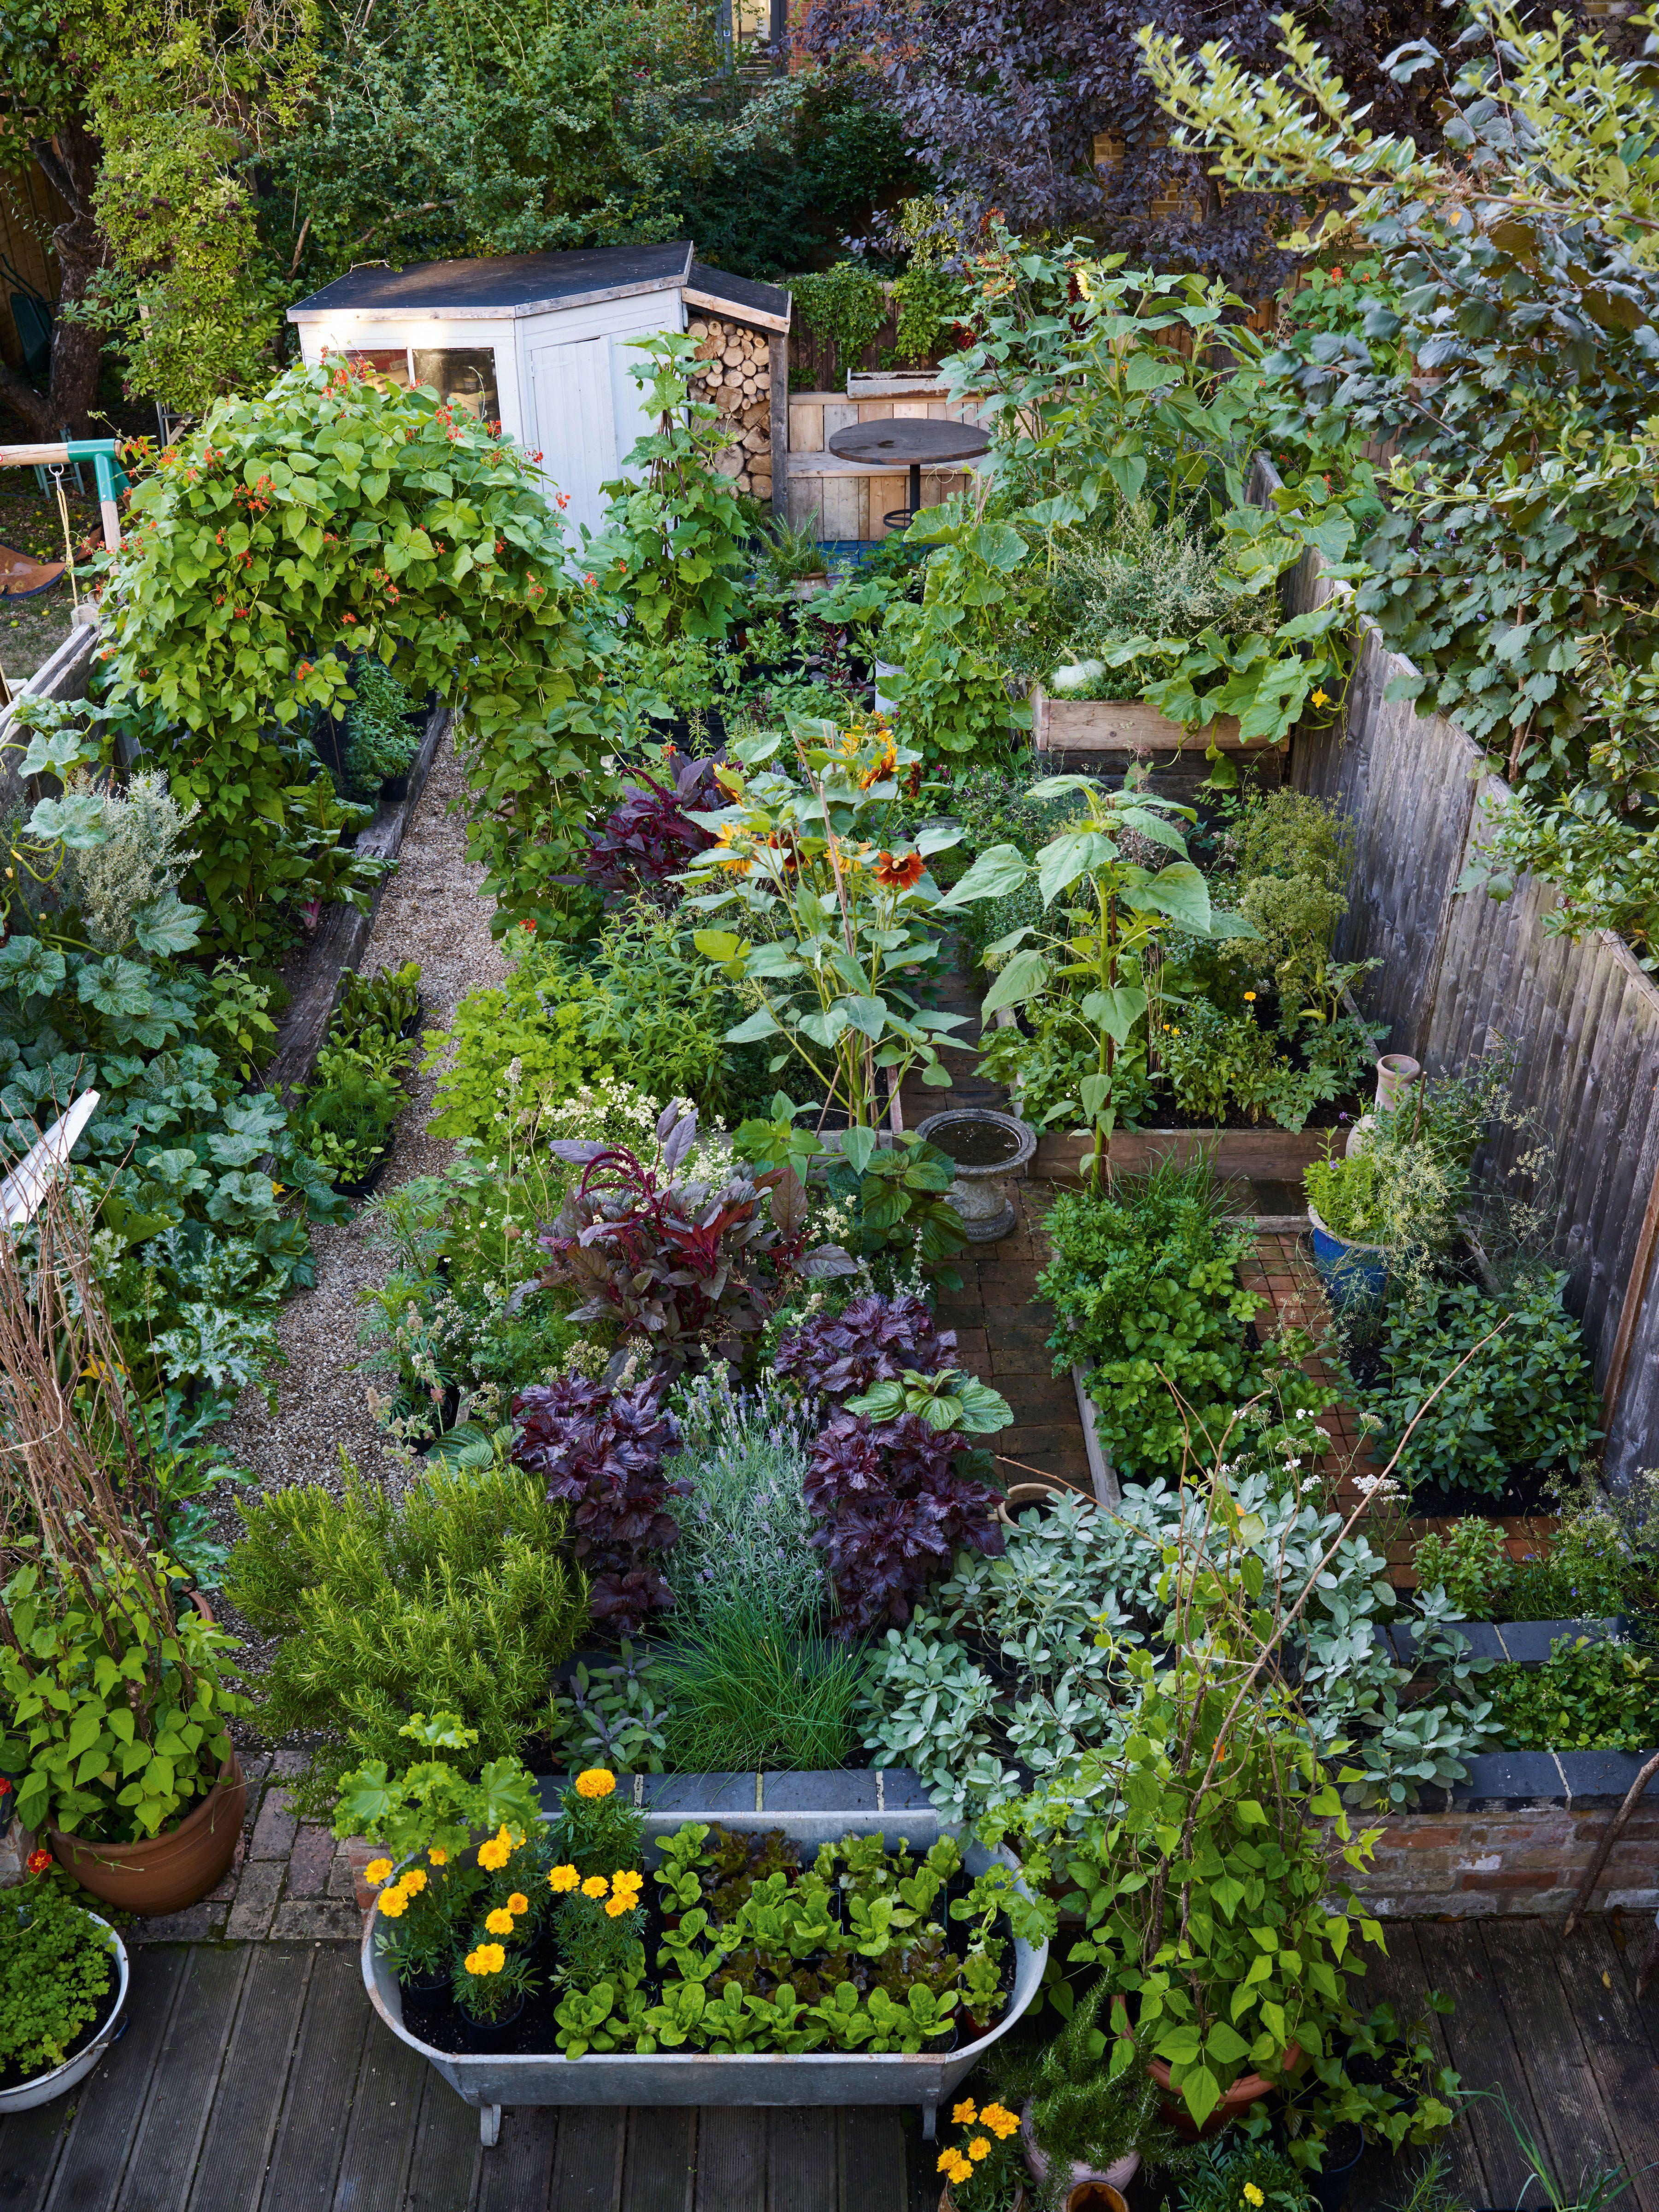 Growing An Edible Garden What To Plant In 2020 Garden Layout Vegetable Garden Design Cottage Garden